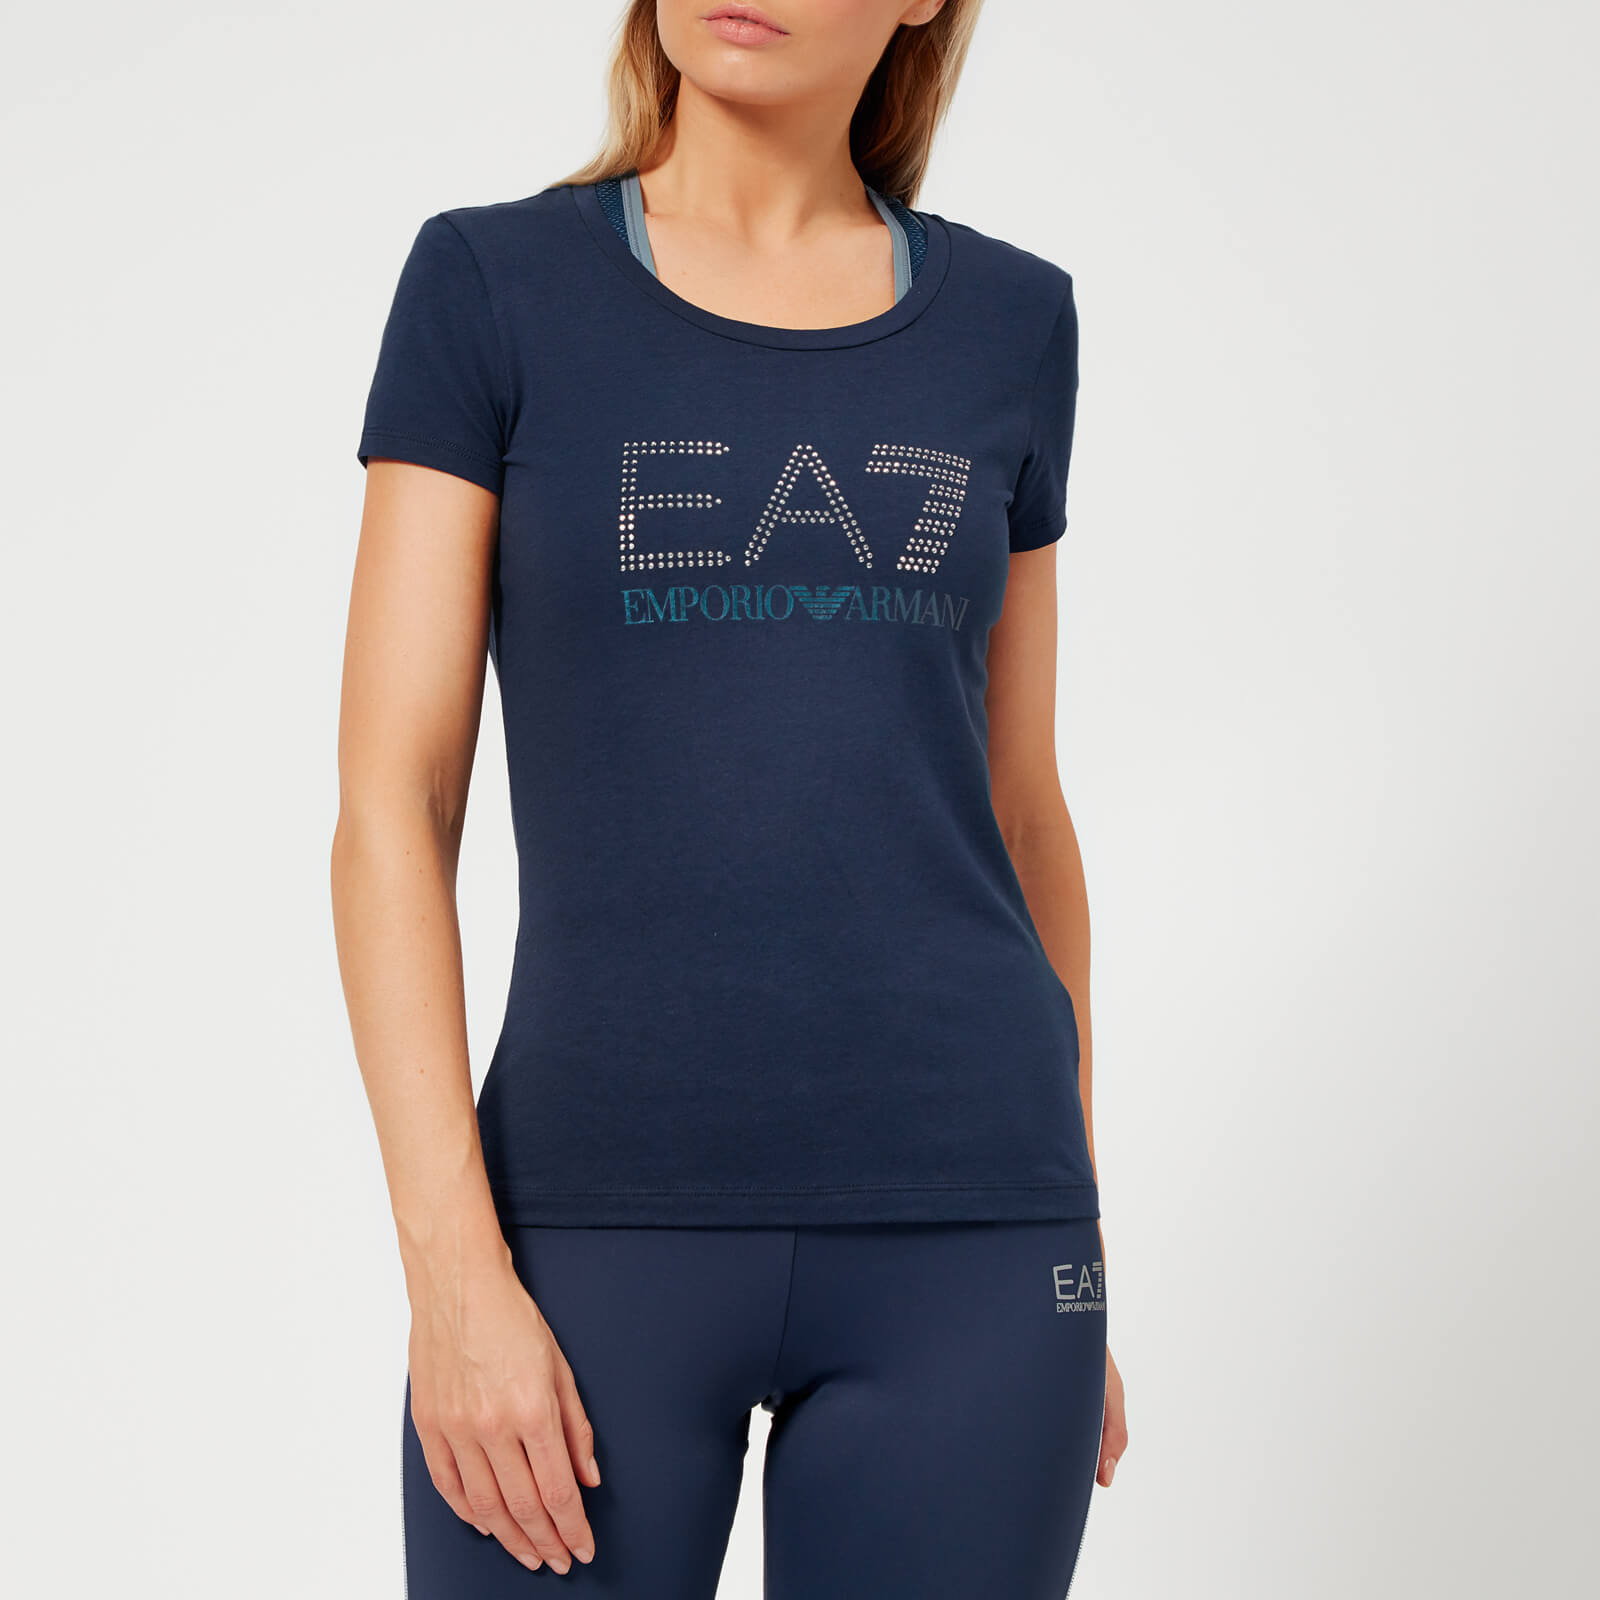 e343c1d0033f Emporio Armani EA7 Women's Train Logo Series Short Sleeve T-Shirt with  Studs - Navy Blue Sports & Leisure | TheHut.com